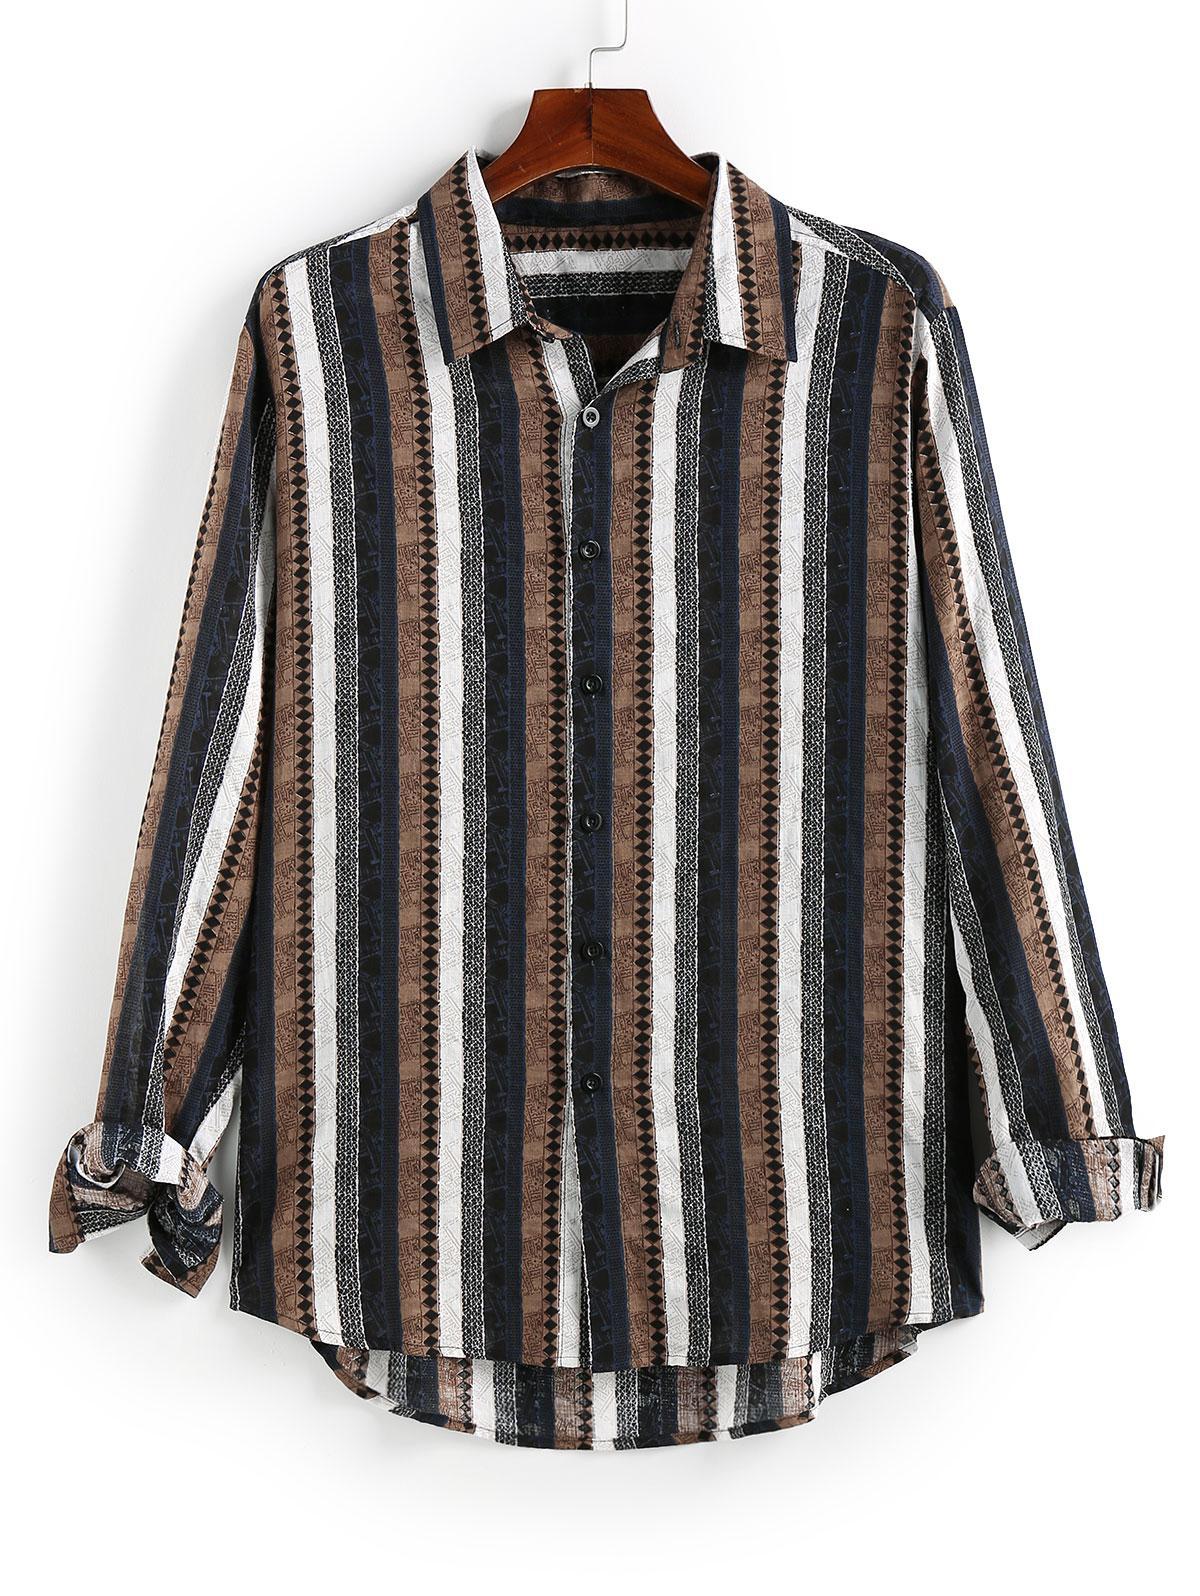 Chemise Haute Basse Boutonnée Rayée Imprimée - ZAFUL - Modalova